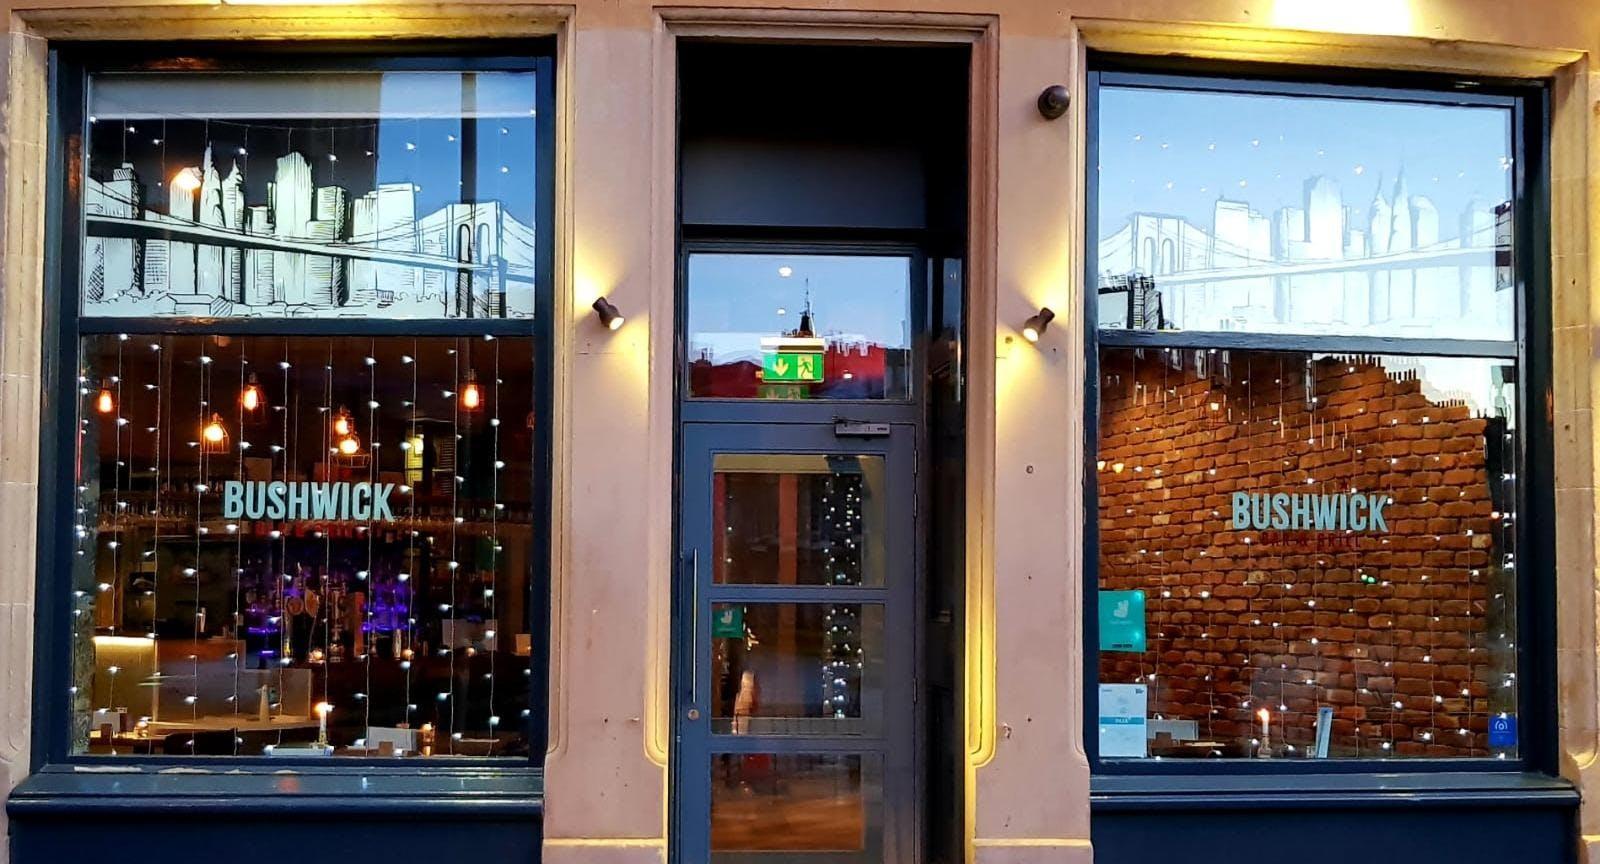 Bushwick Bar & Grill Edinburgh image 1